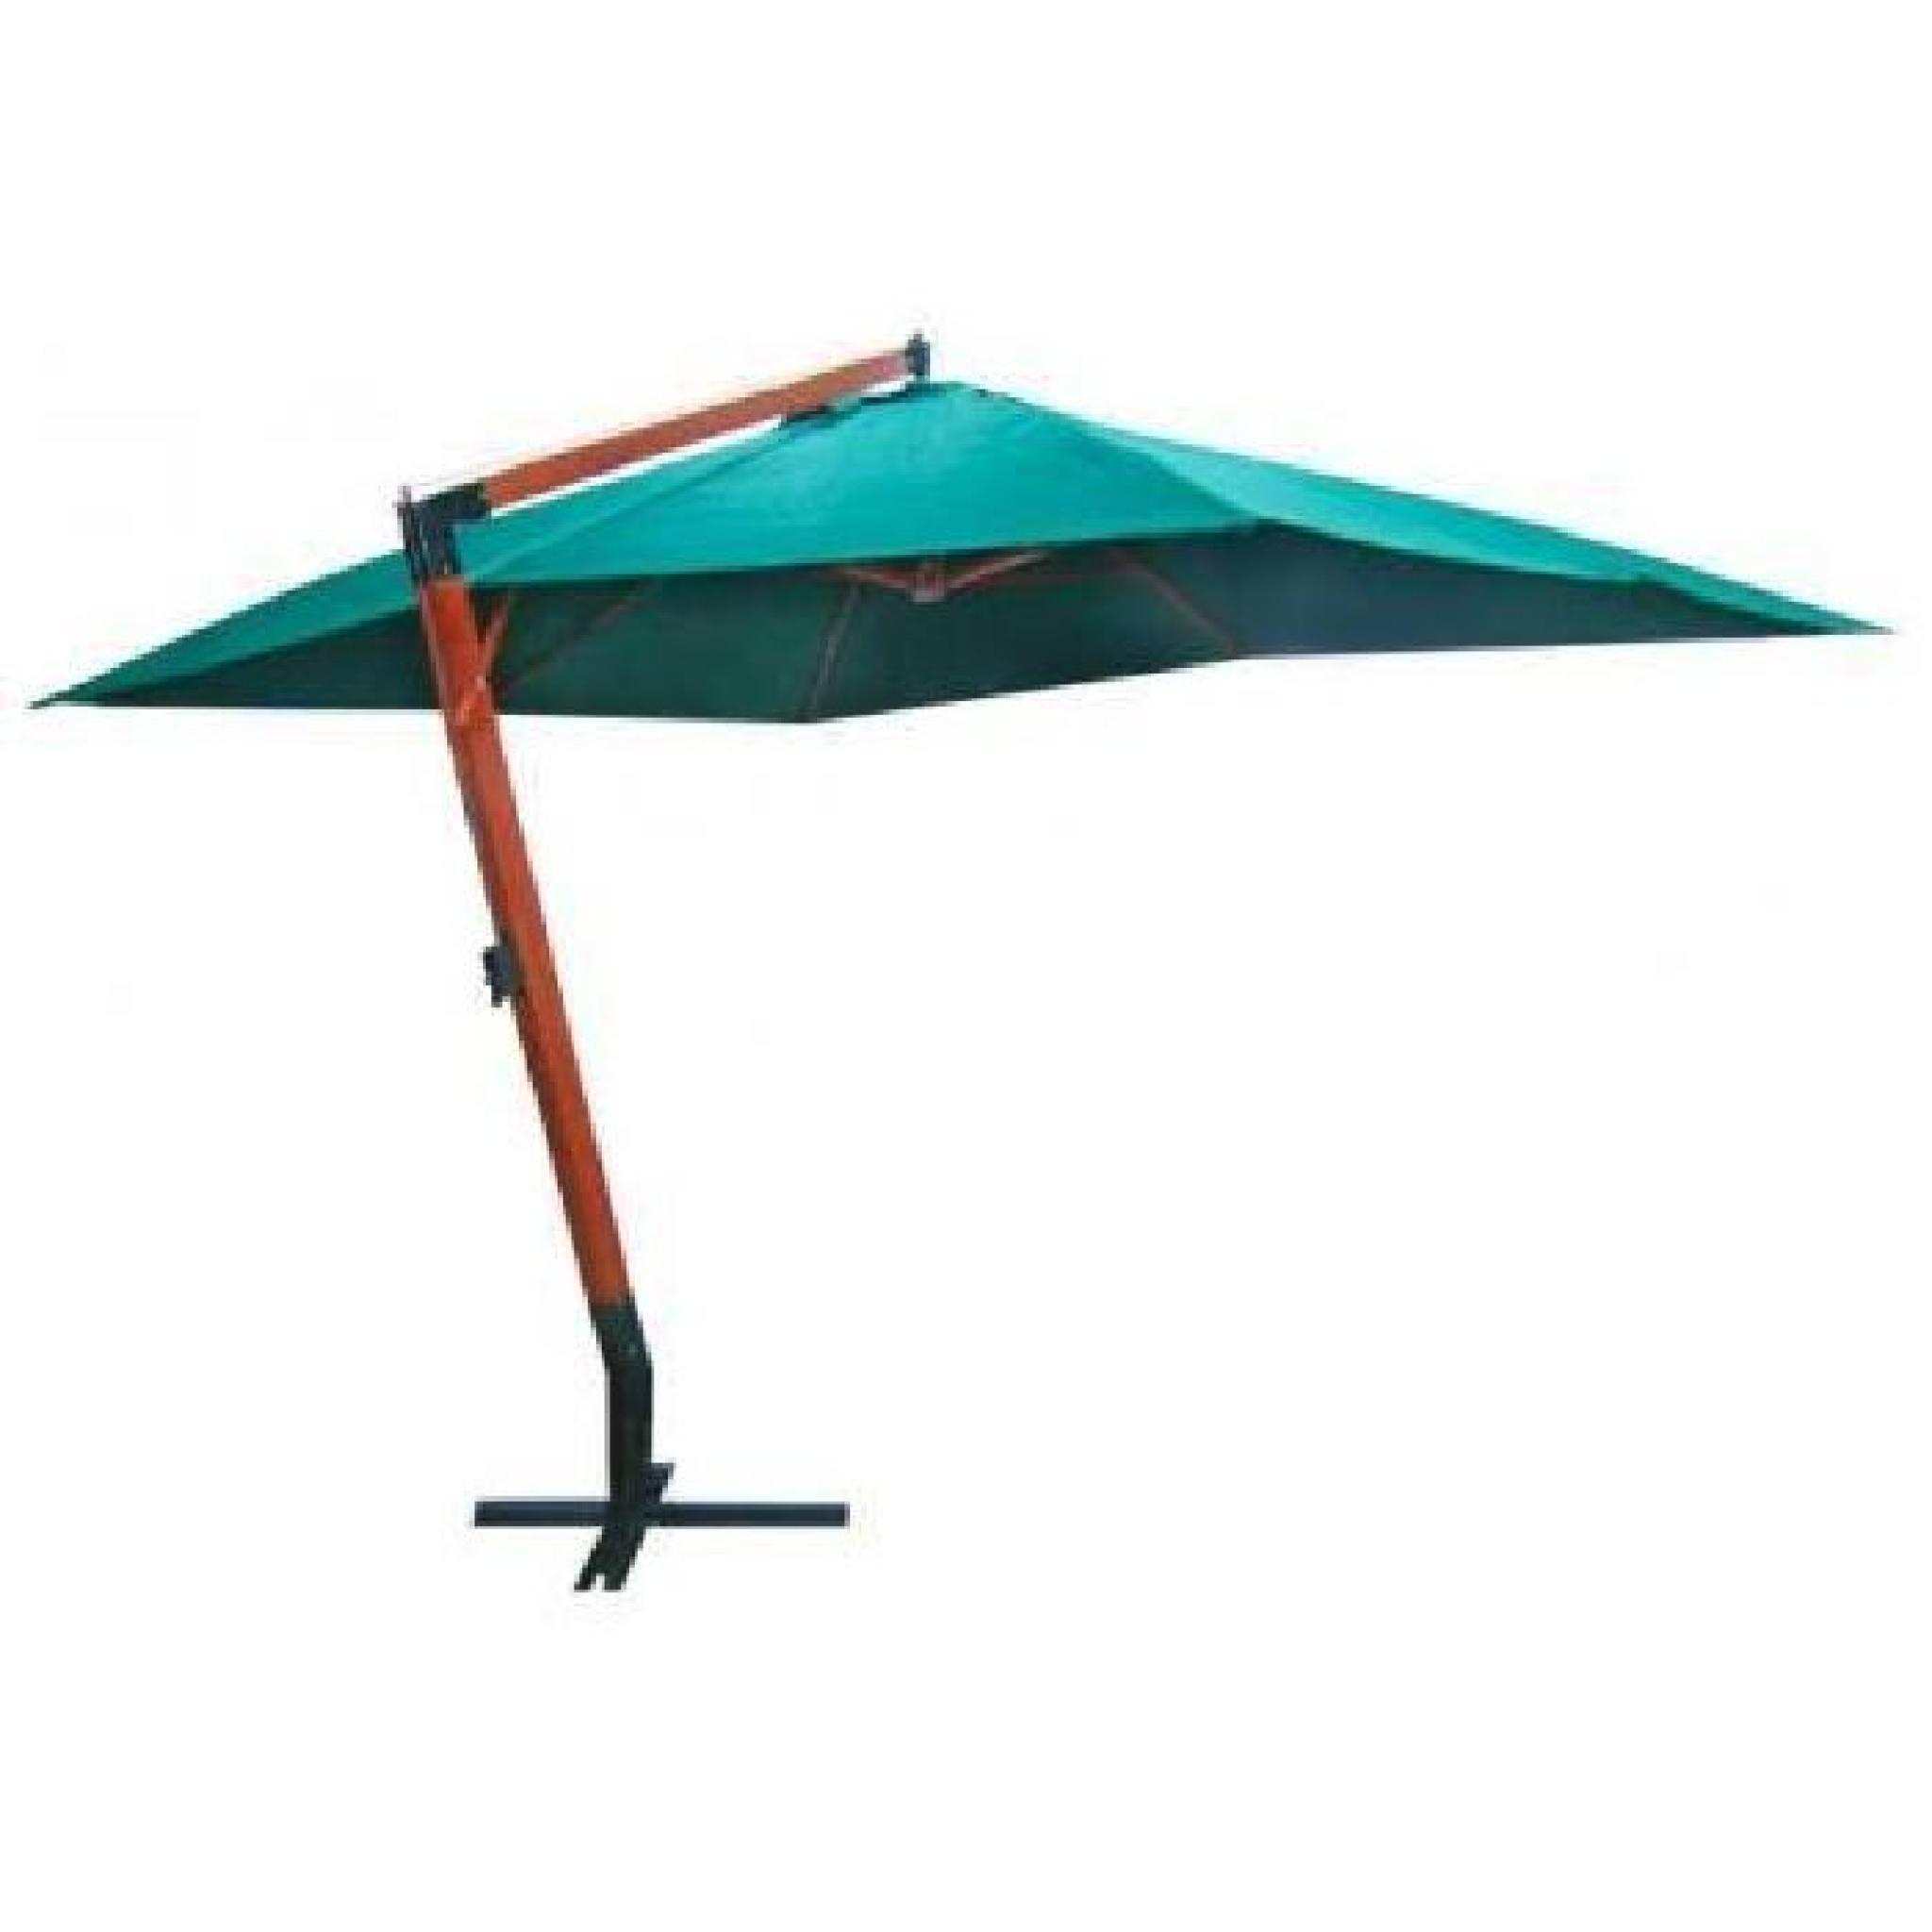 parasol deporte vert 300 x 400 cm achat vente parasol. Black Bedroom Furniture Sets. Home Design Ideas